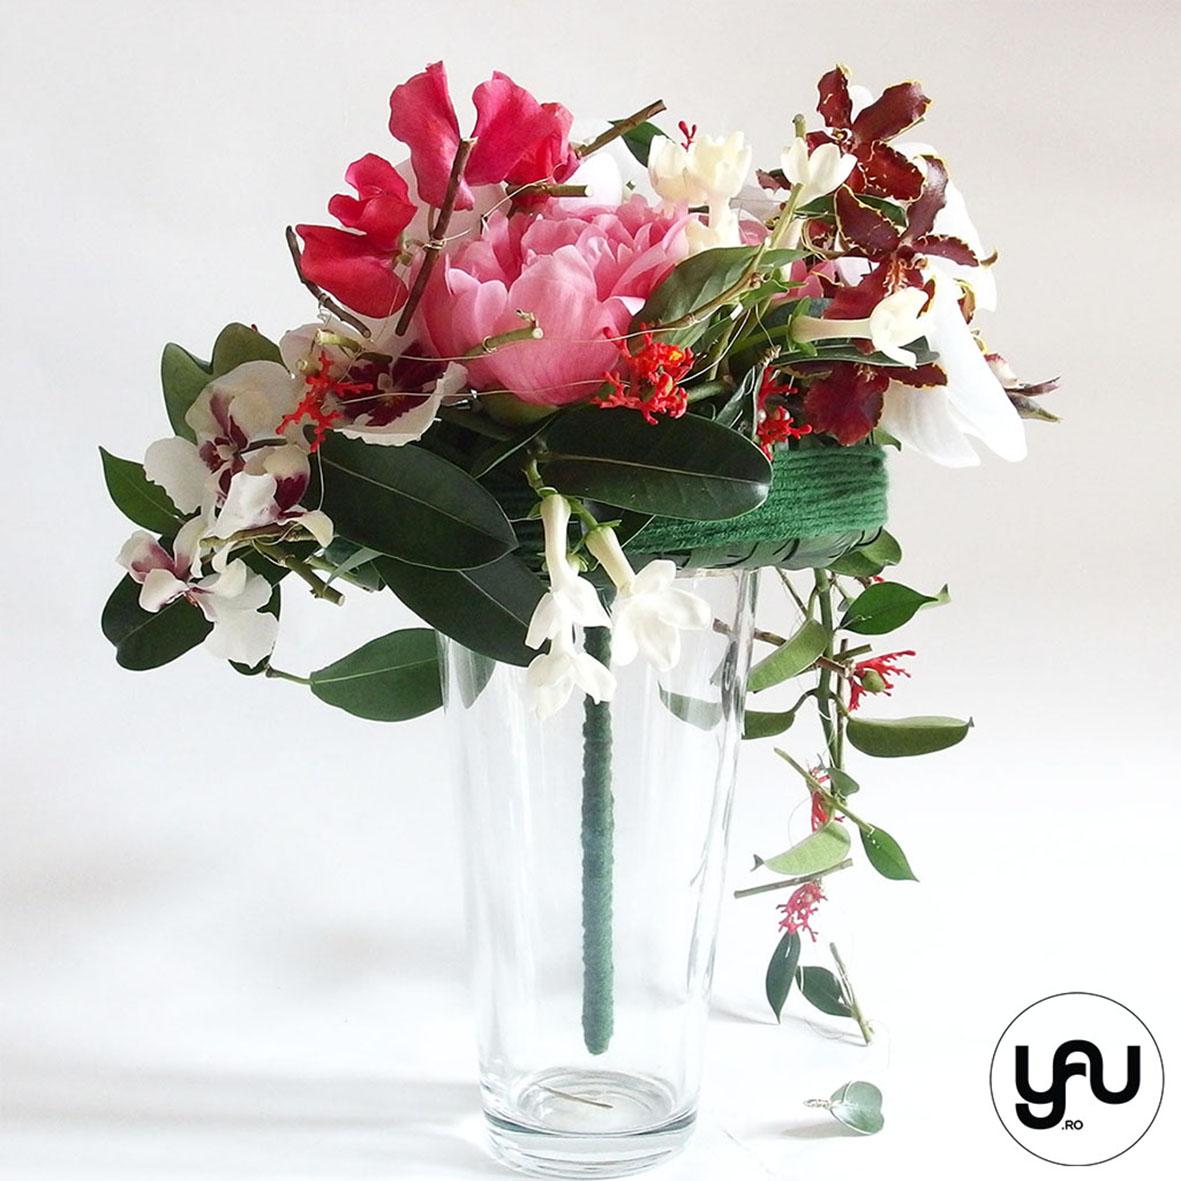 codrul-cu-flori-albe-bujori-mathiola-orhidee-_-yau-evenimente-2016-_-nunta-la-zexe-_-elenatoader-23